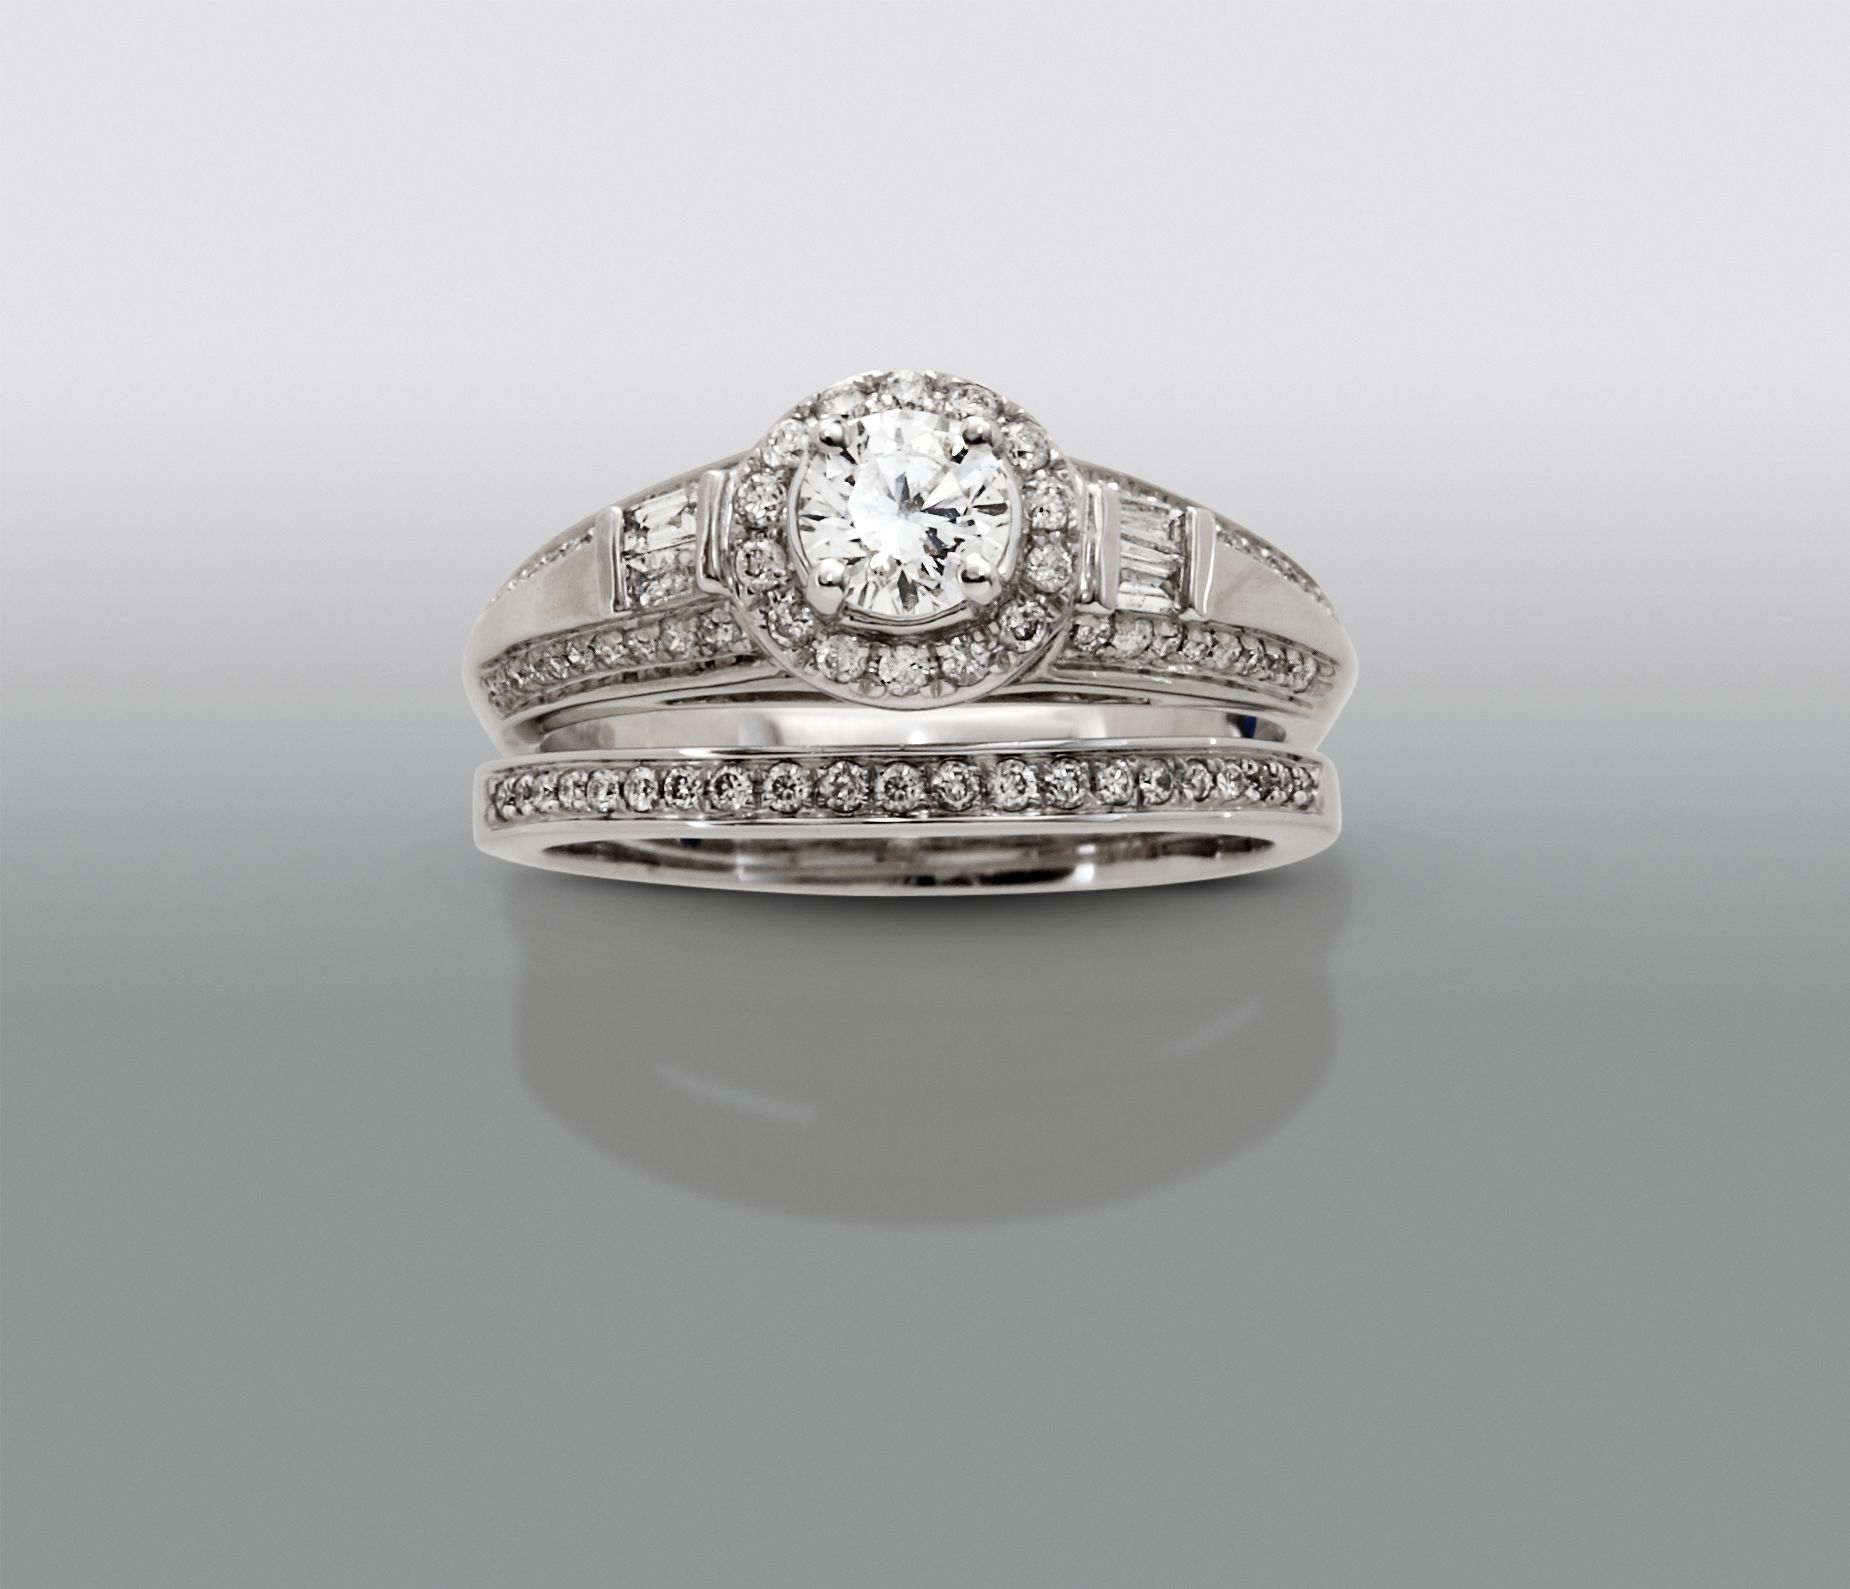 David Tutera 1 Cttw Certified Diamond Bridal Set 14kt White Gold